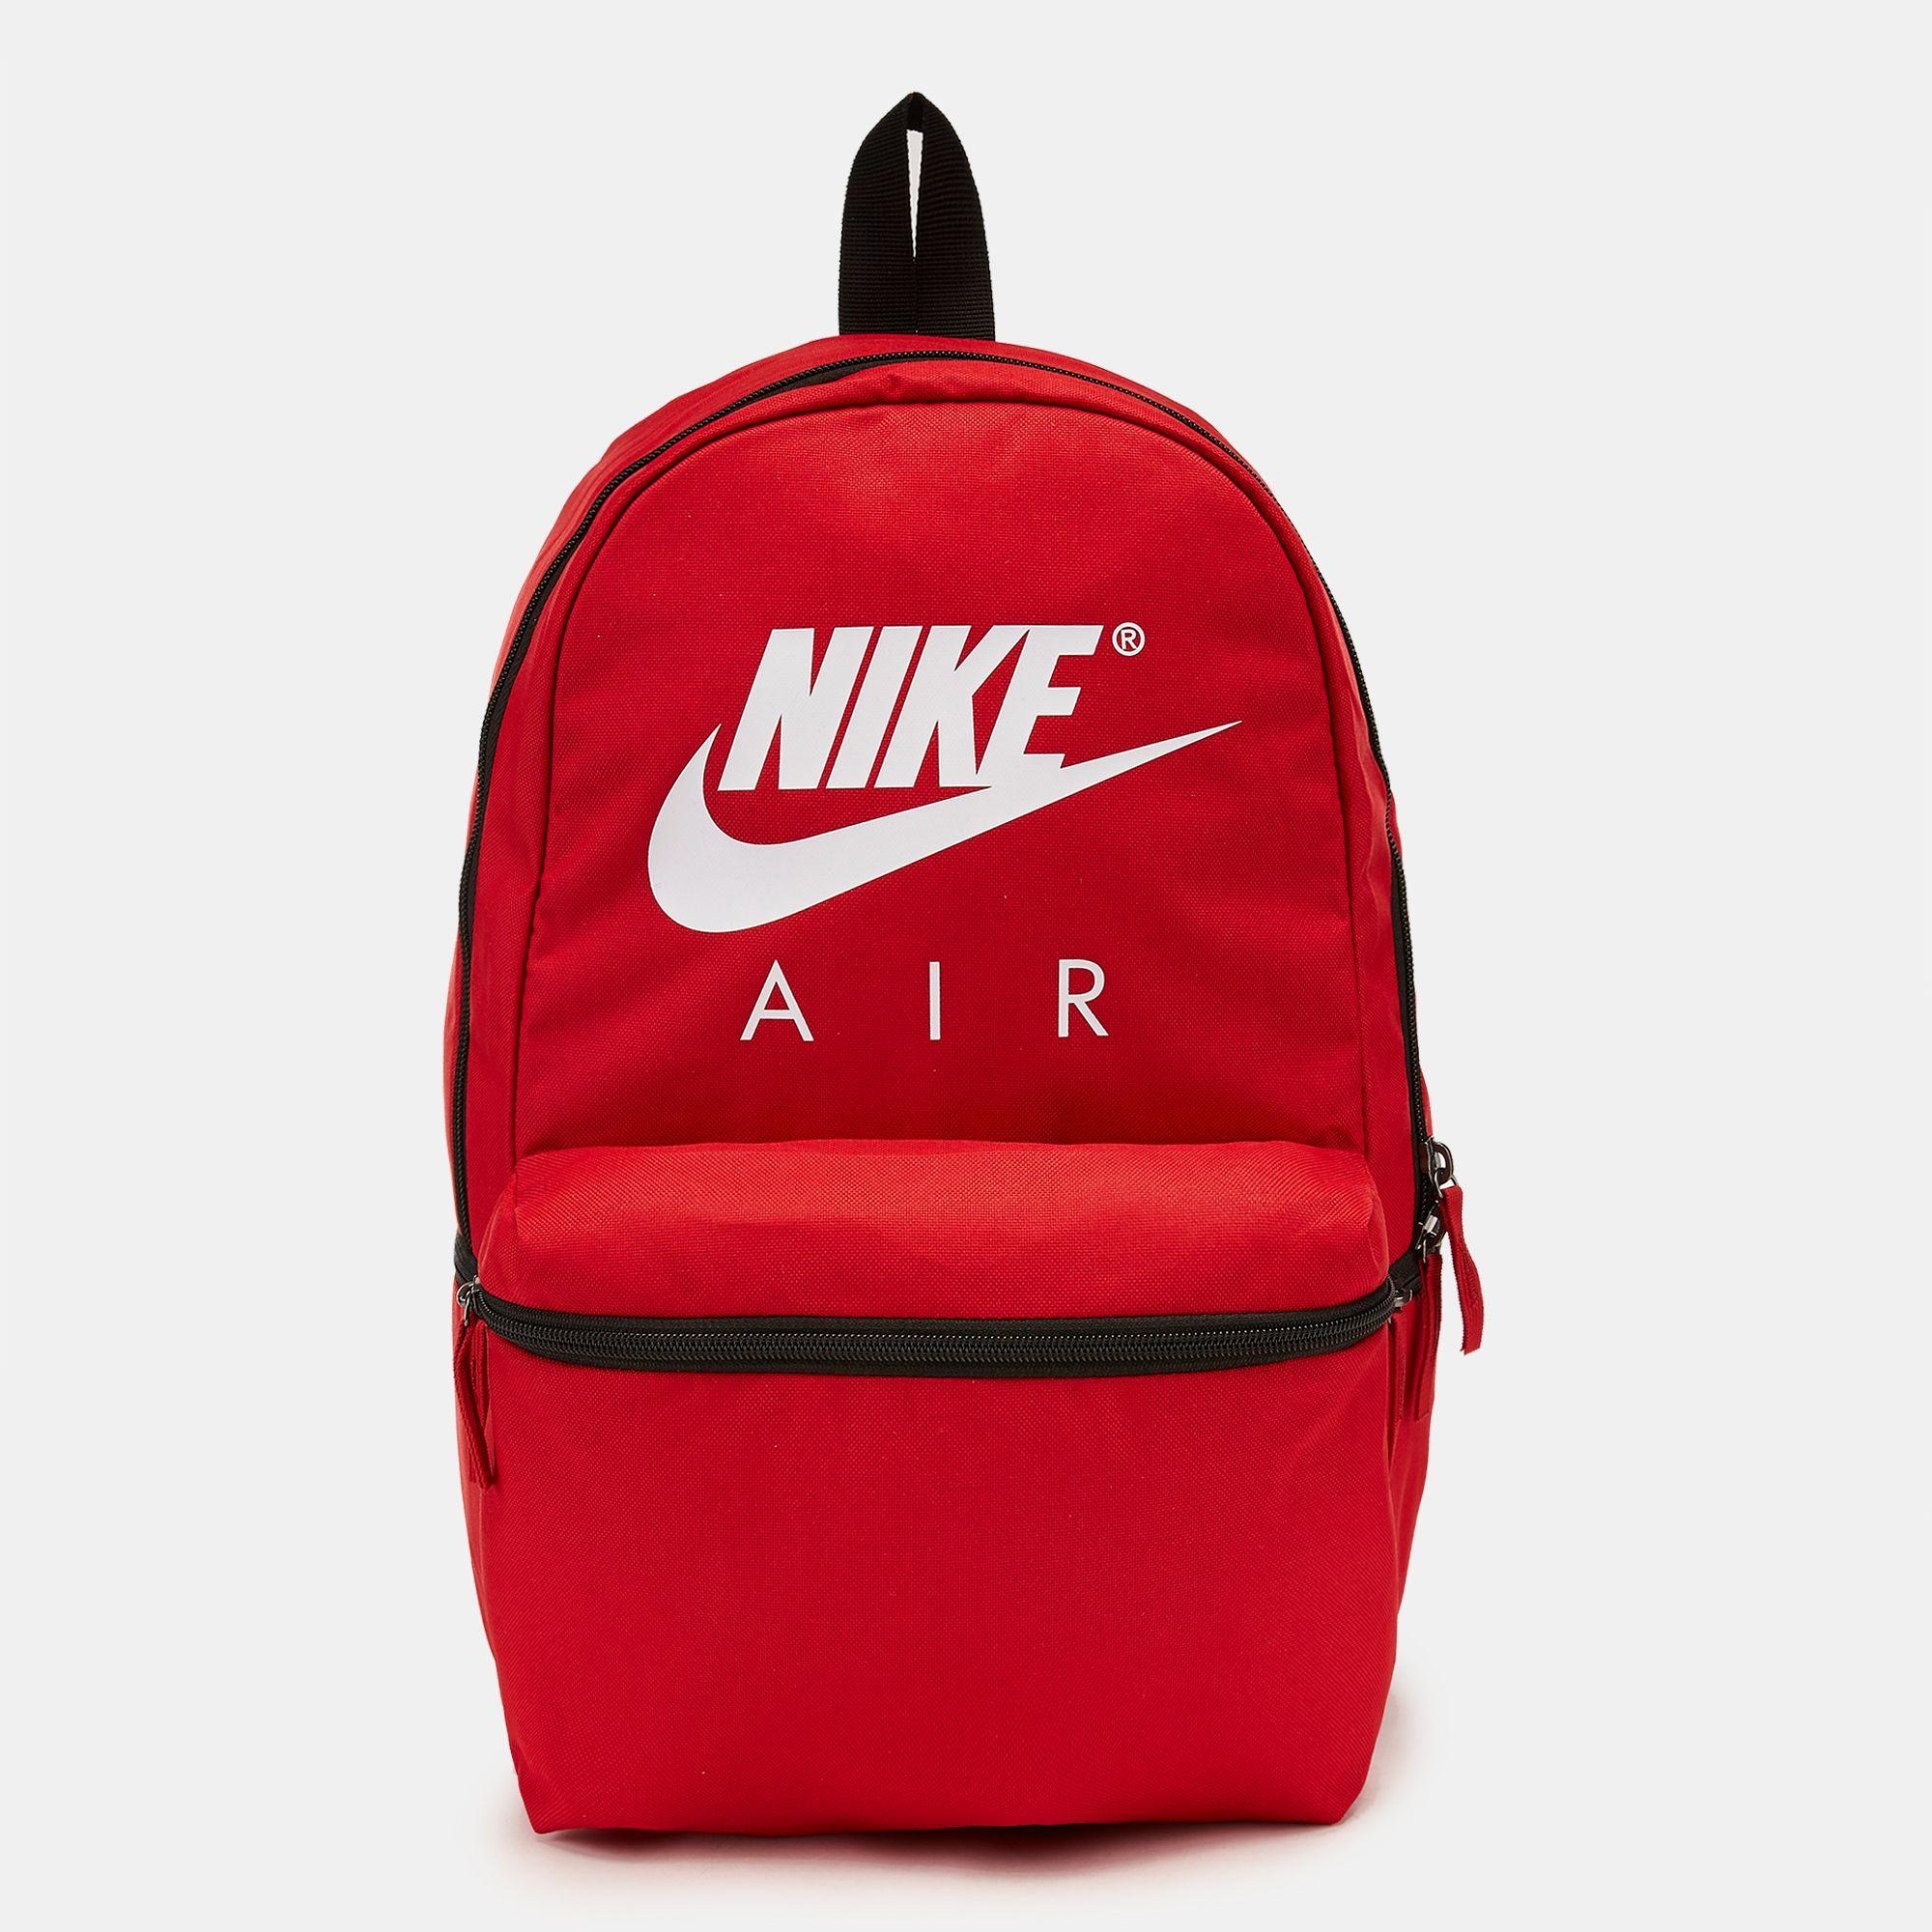 Nike Air Backpack Red  b589c57f954d1